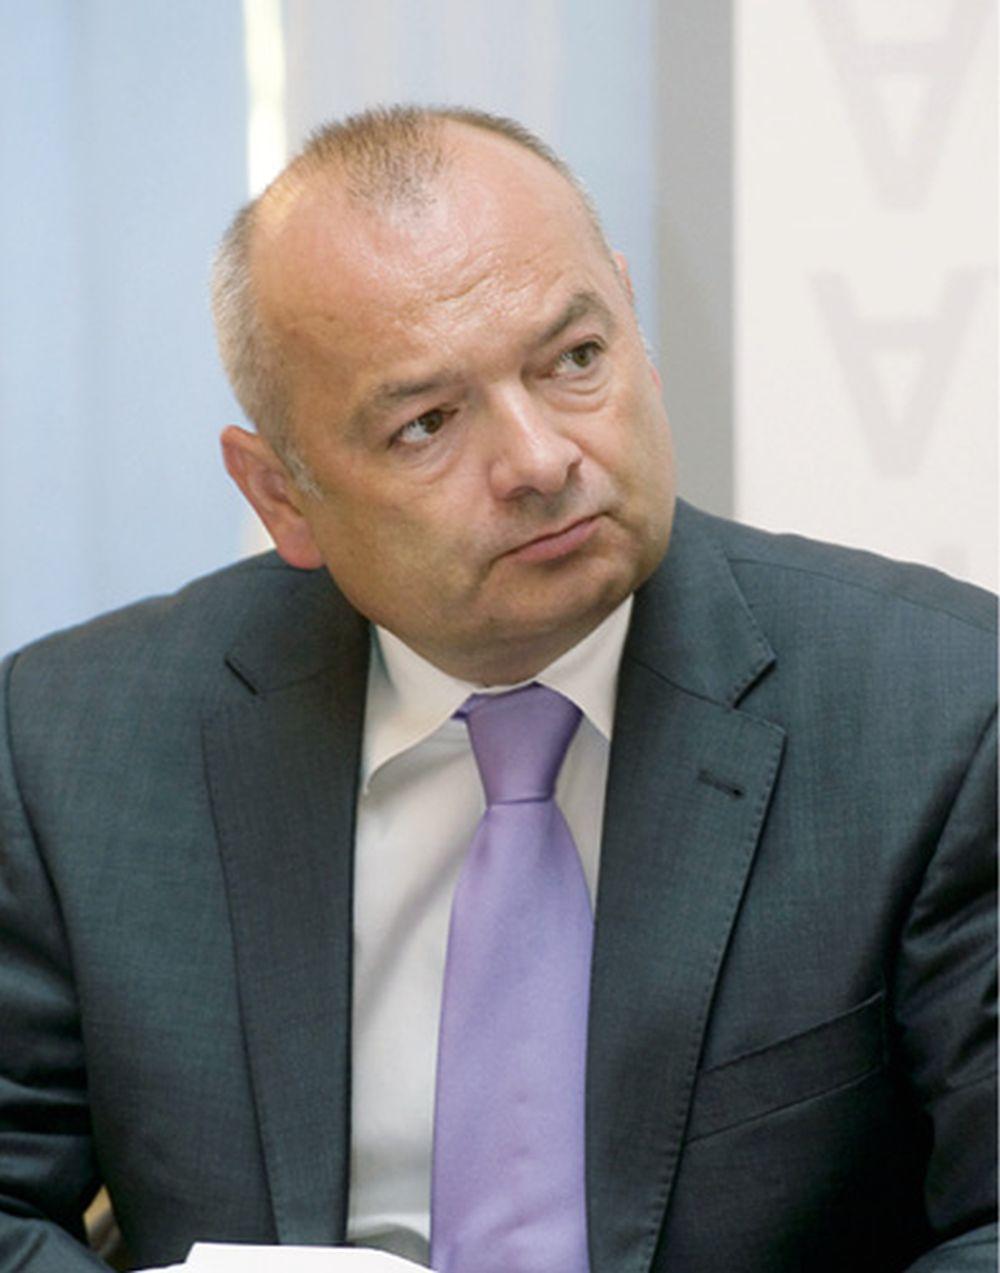 Dubravko Štimac kandidat za ministra financija